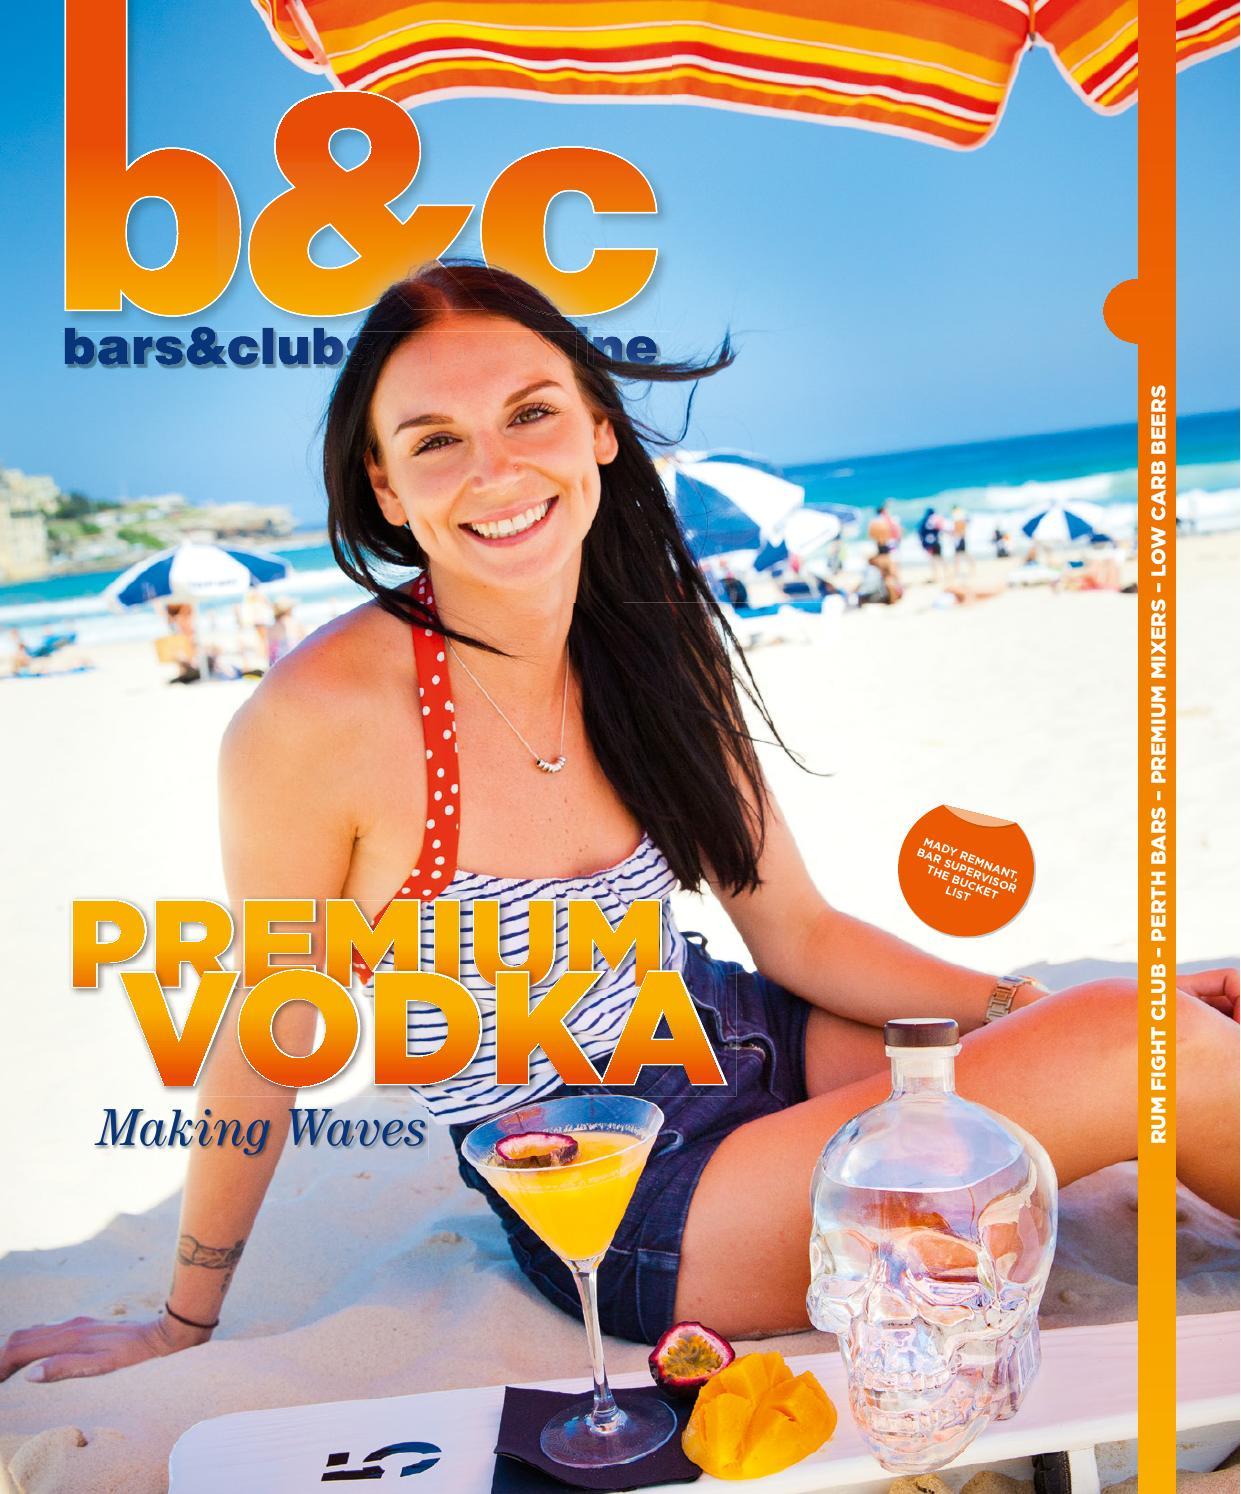 Bars & Clubs January/February 2013